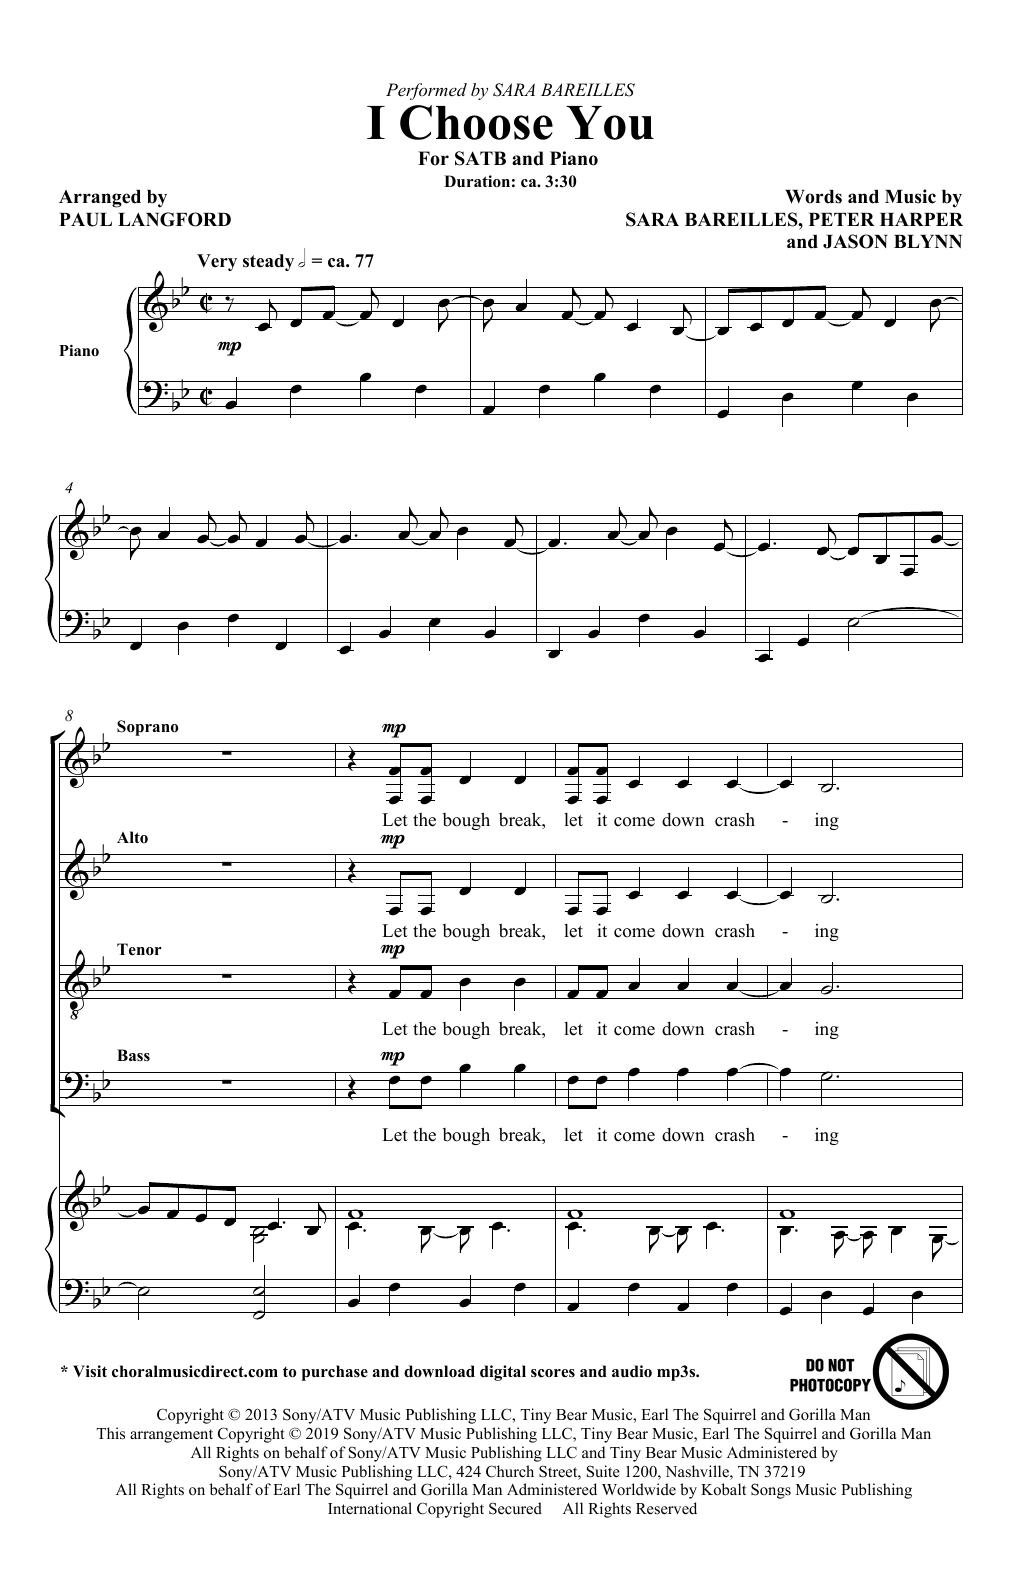 I Choose You (arr. Paul Langford) (SATB Choir)